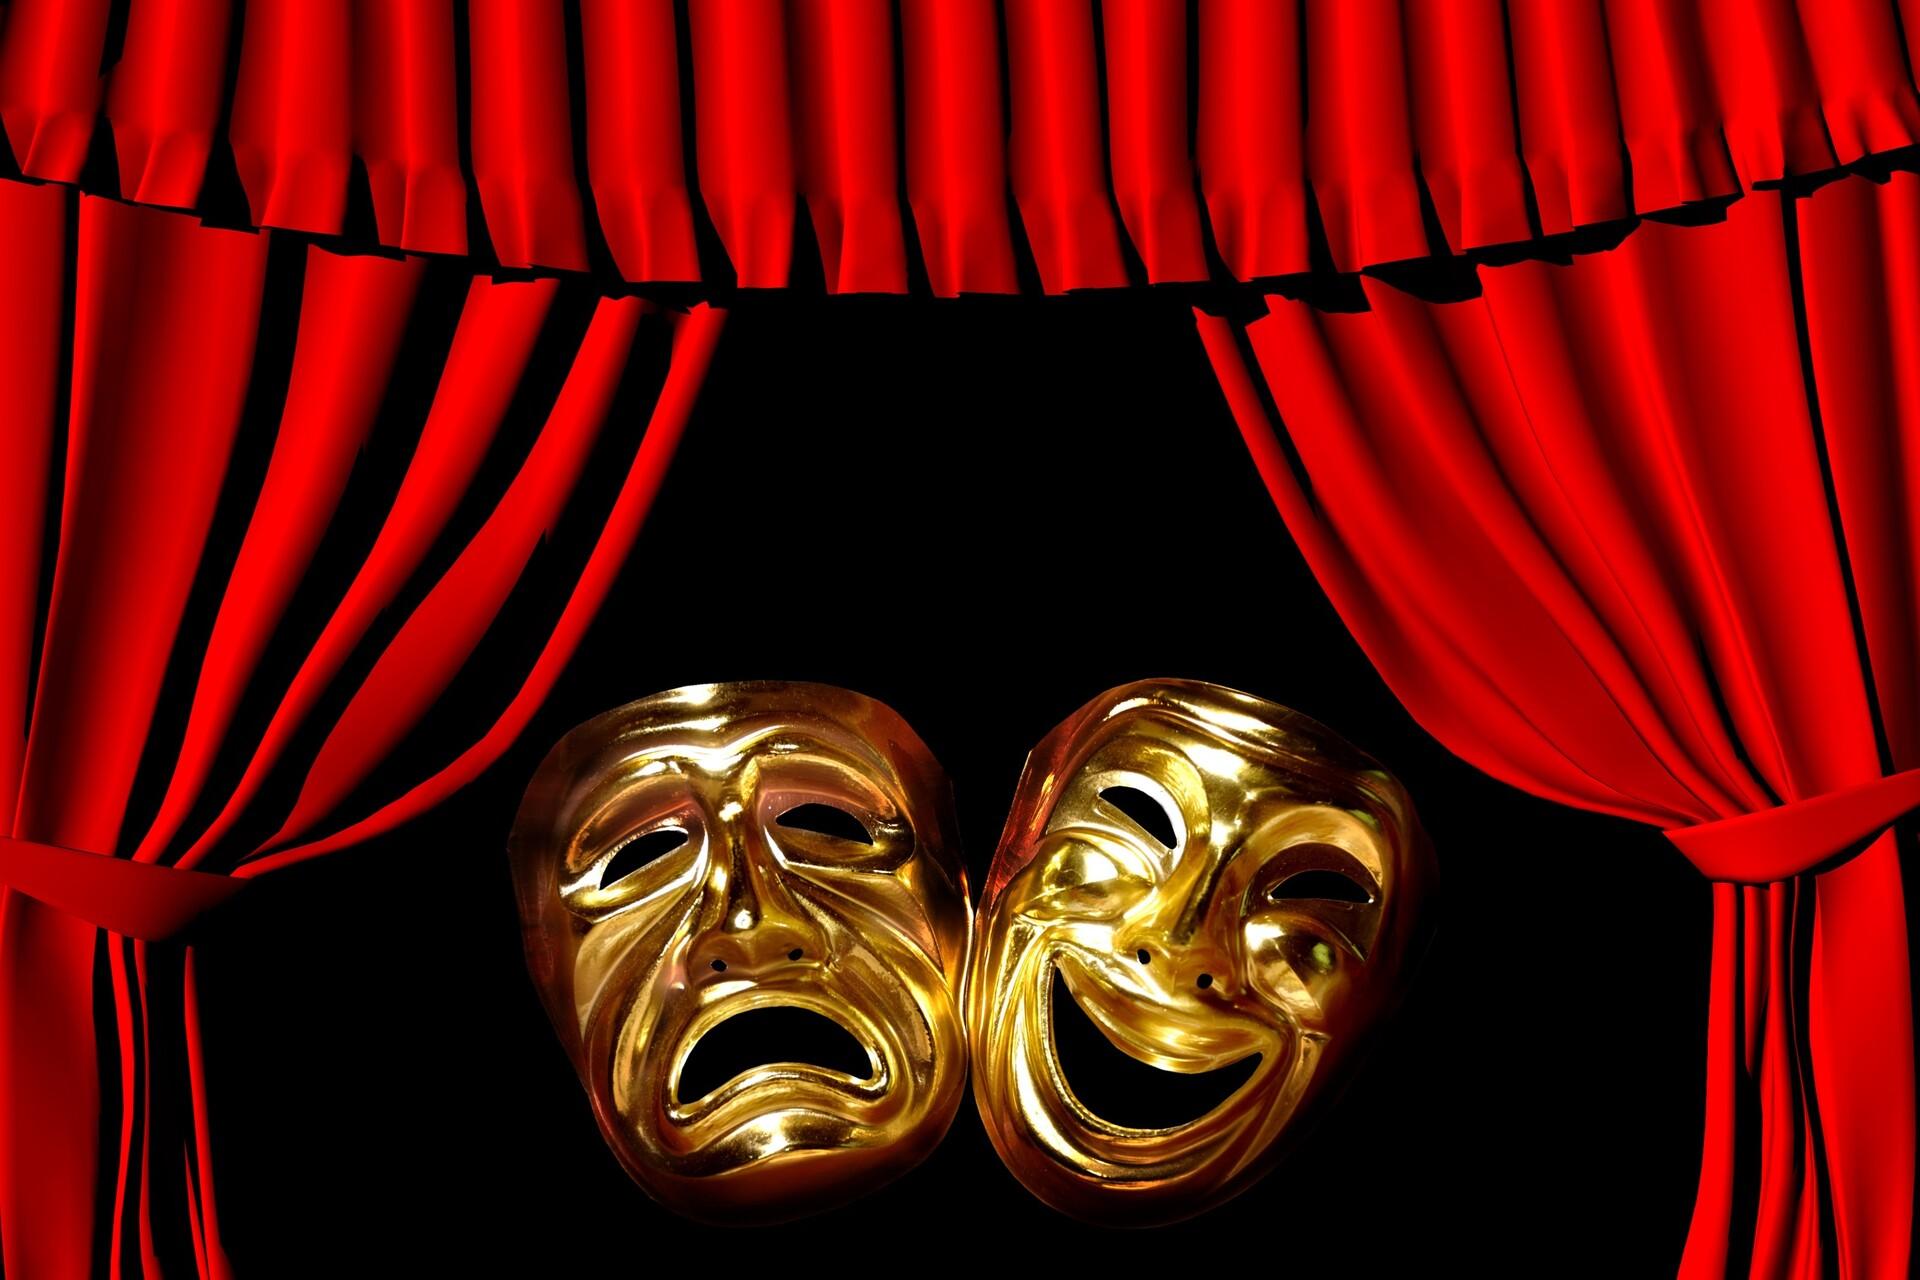 Картинки о театре, внимание картинки